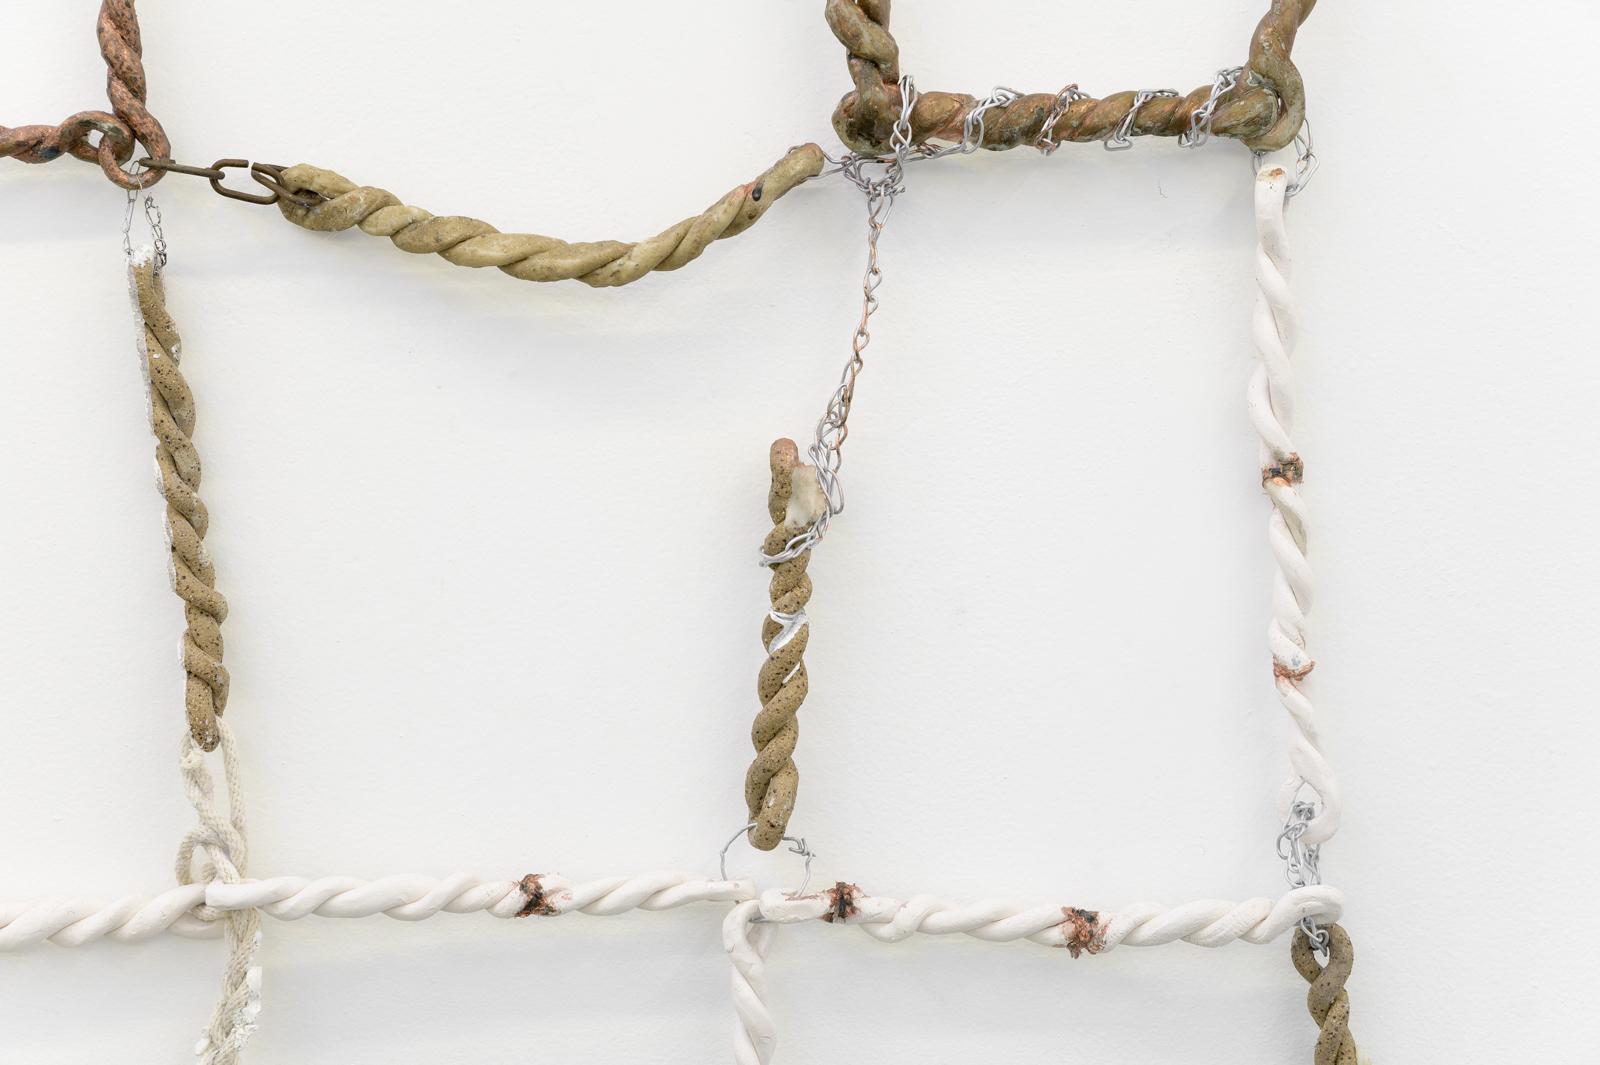 Jordan Mitchell-Fletcher,  Untitled (Chain 1)  (detail), 2019.  Image: Aaron Christopher Rees